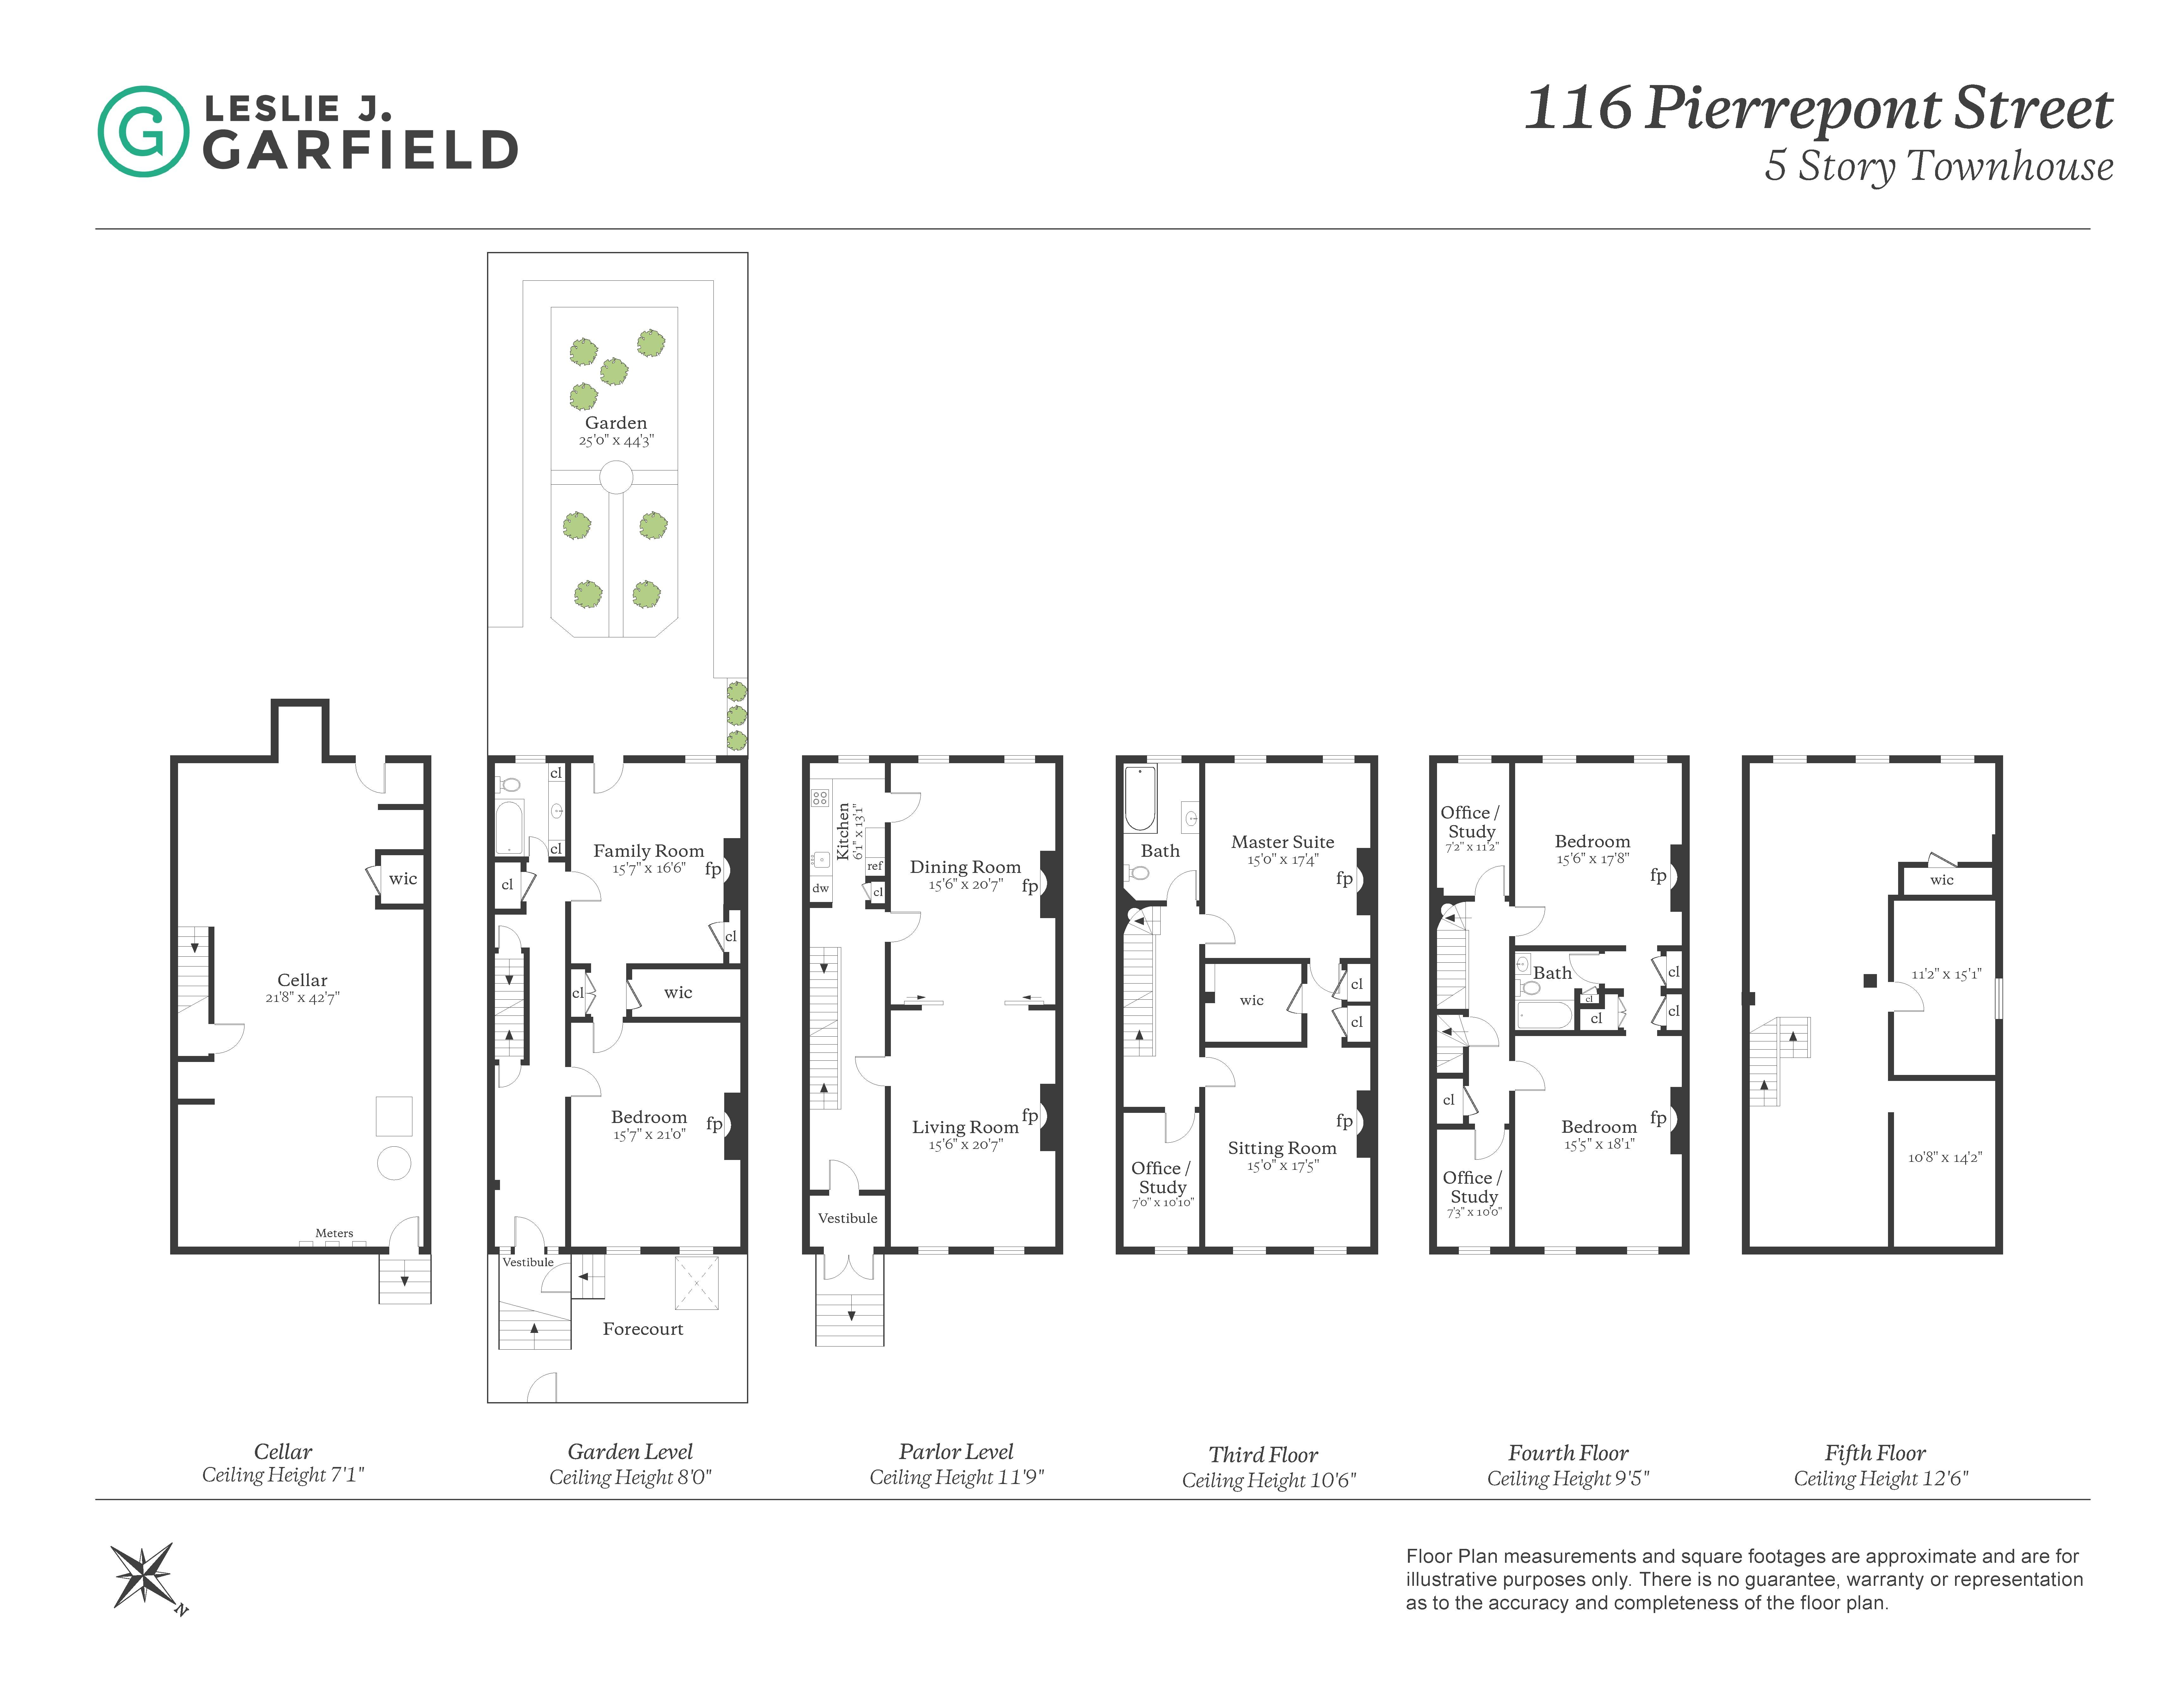 116 Pierrepont Street - b9717650-7b0f-44d1-97c2-95e8df07873c - New York City Townhouse Real Estate